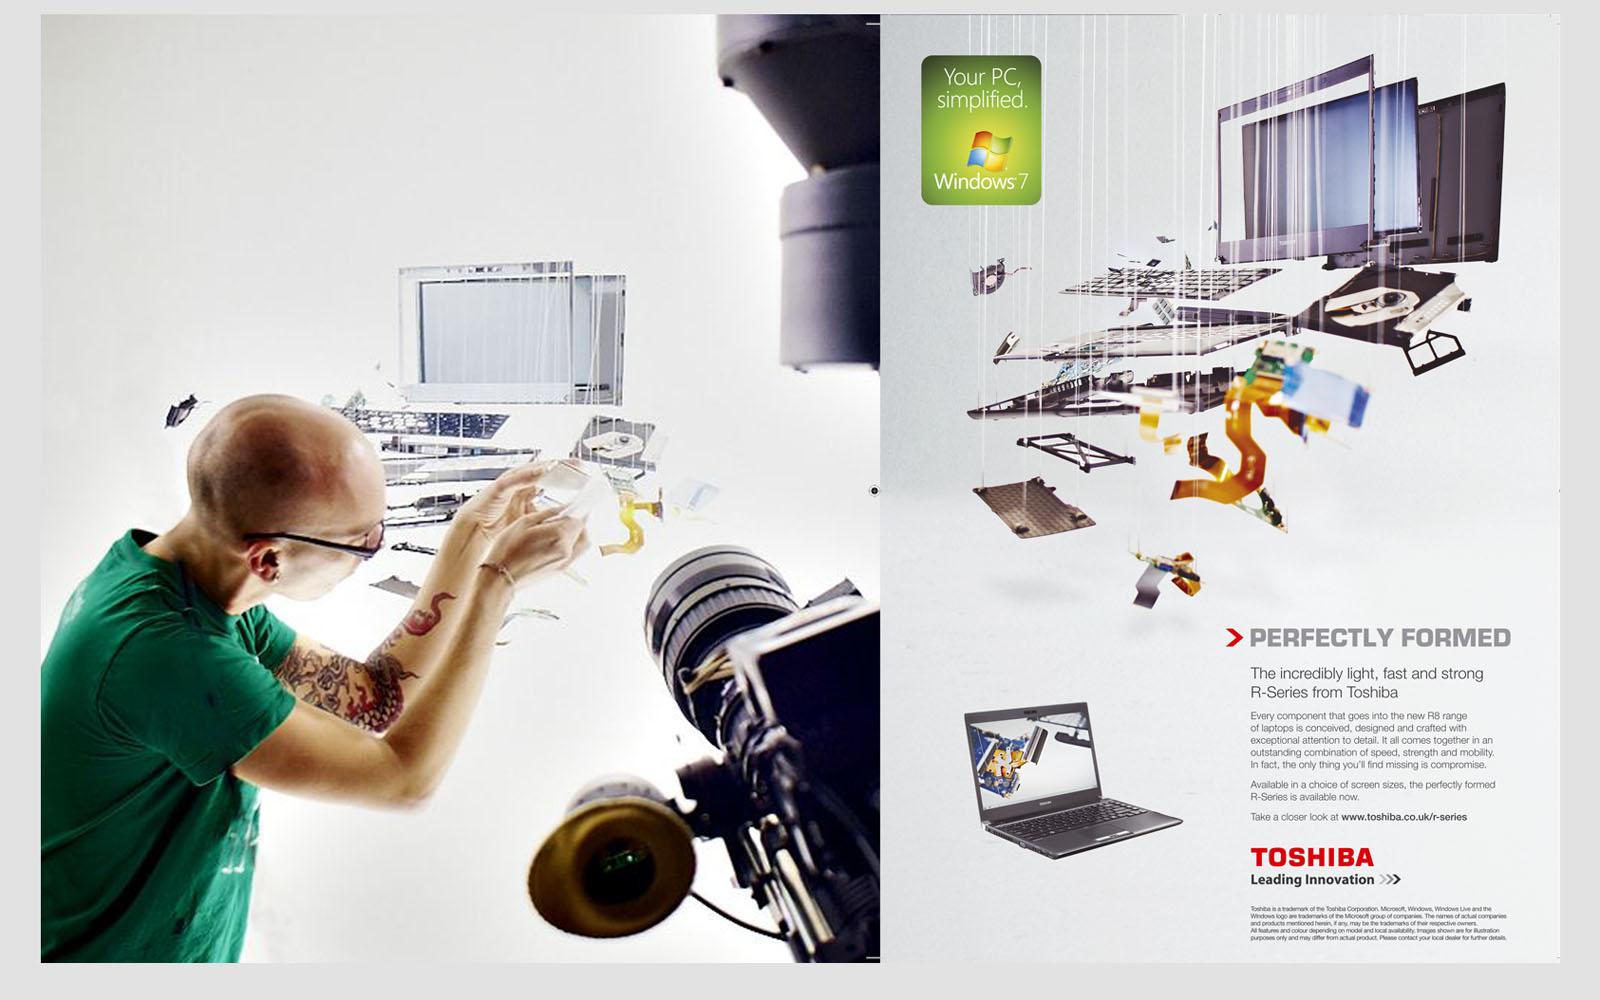 toshiba-laptop.jpg